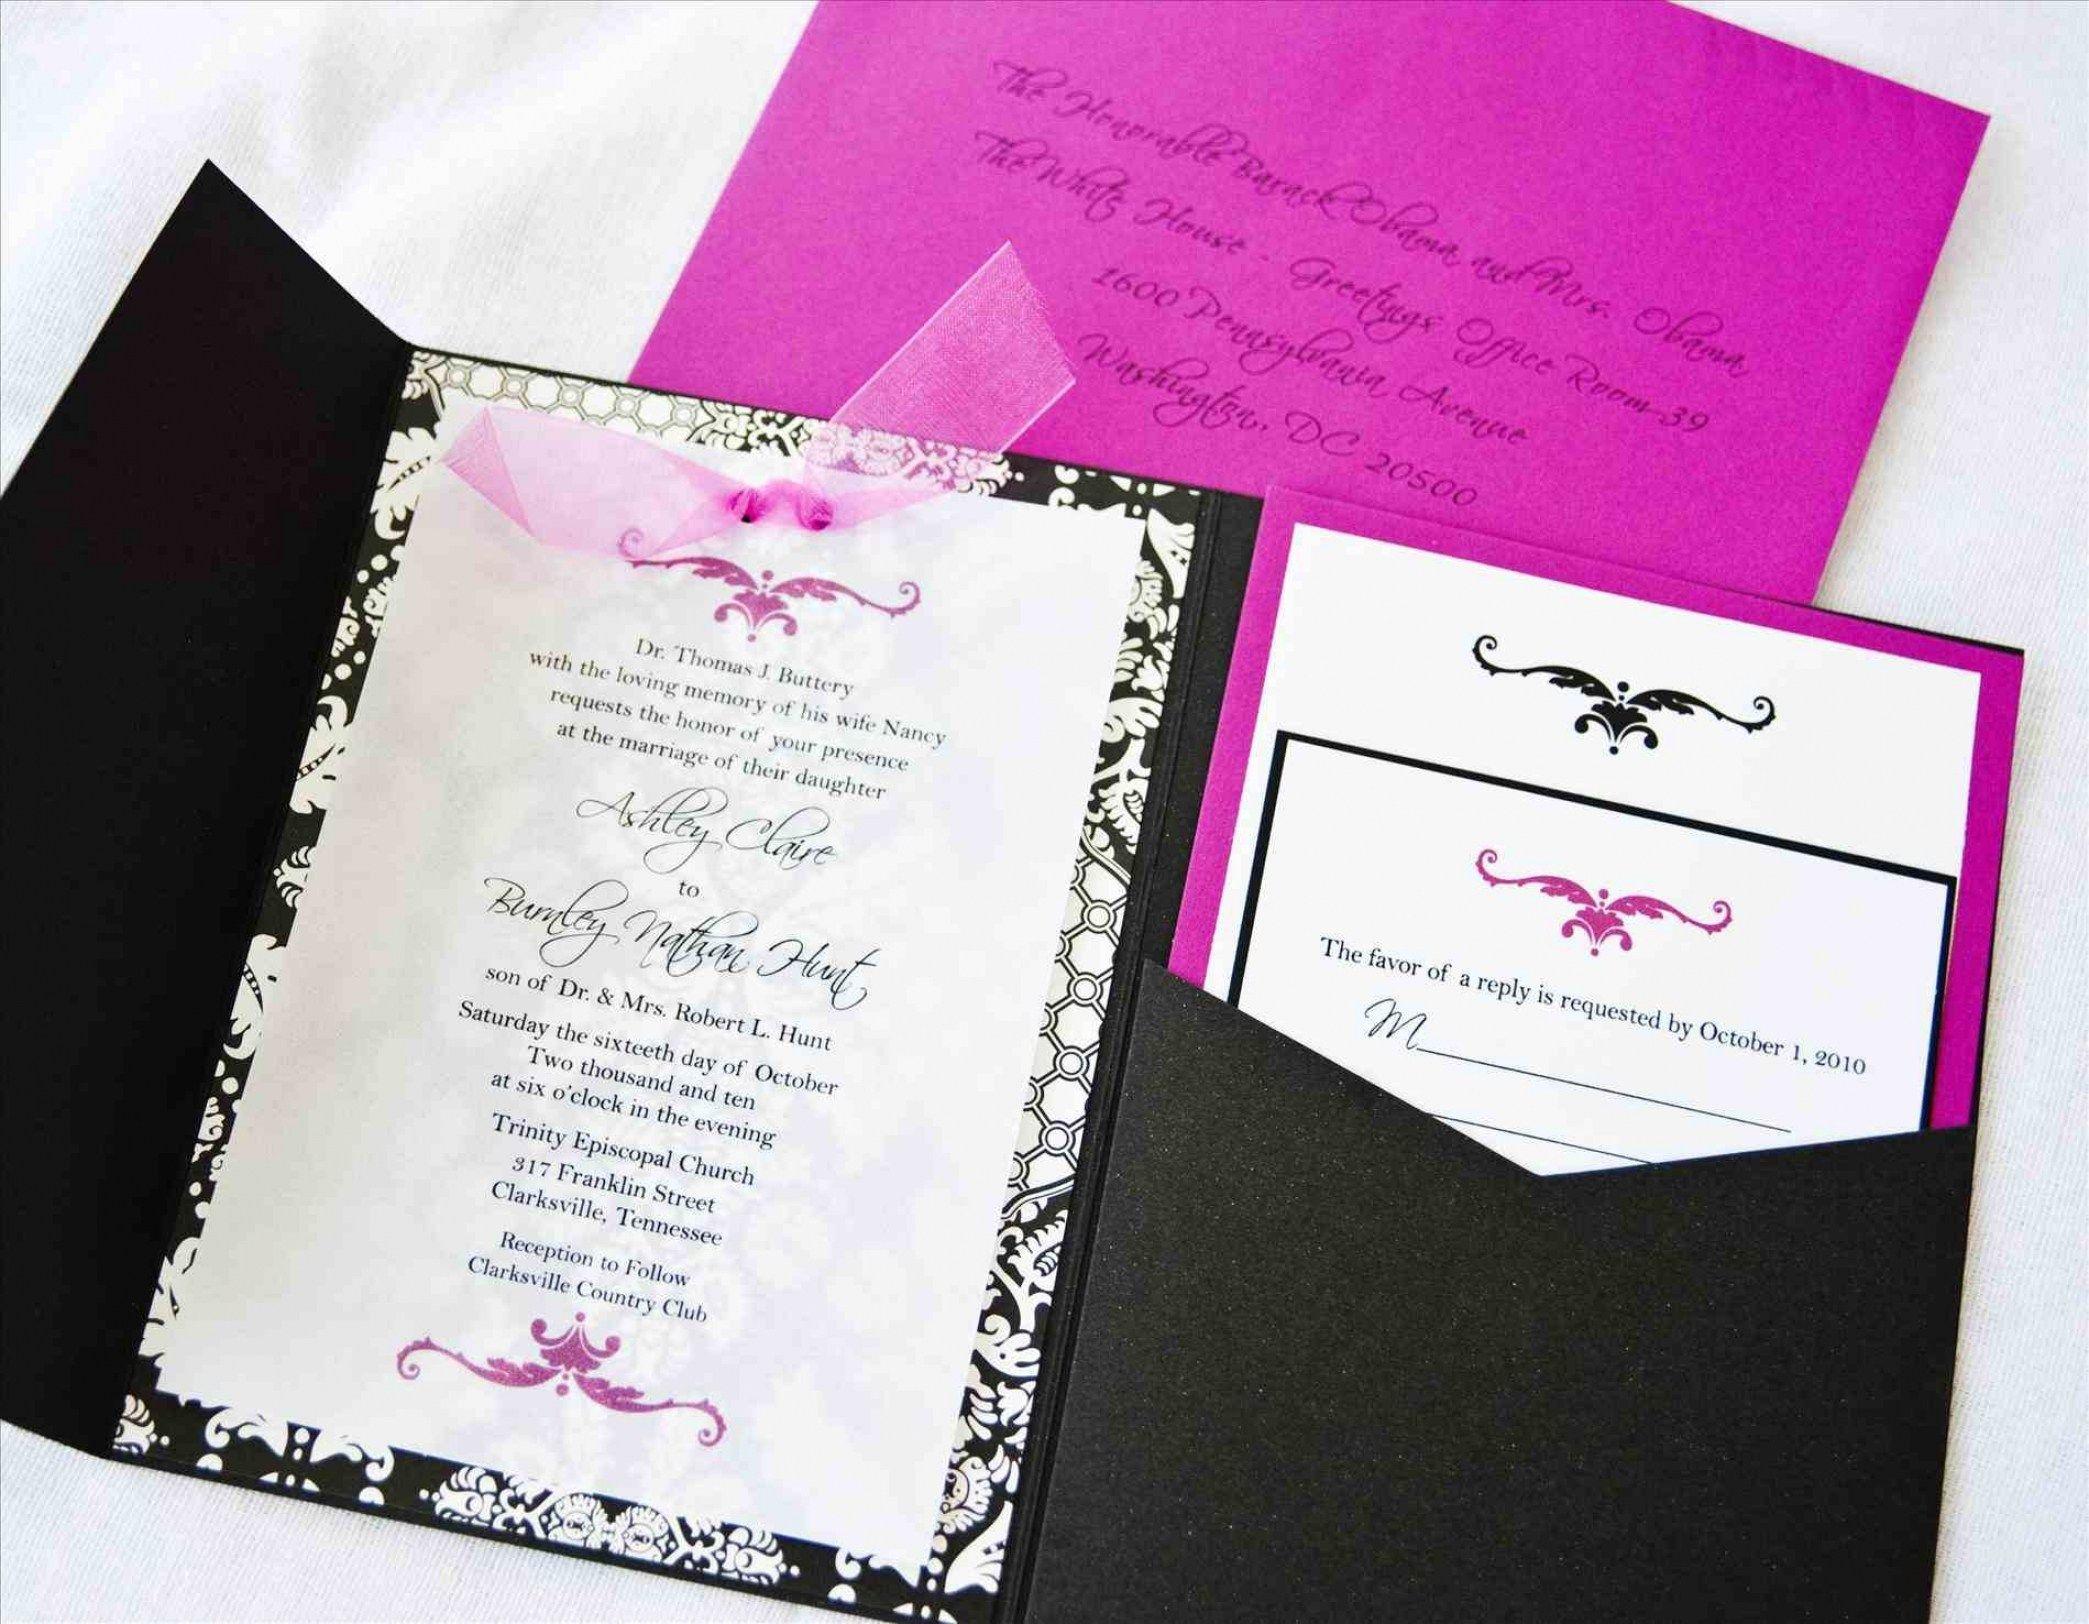 30 diy handmade wedding invitation designs wedding invitation how formal invitation card design to make a simple handmade in handmade wedding invitation designs stopboris Choice Image